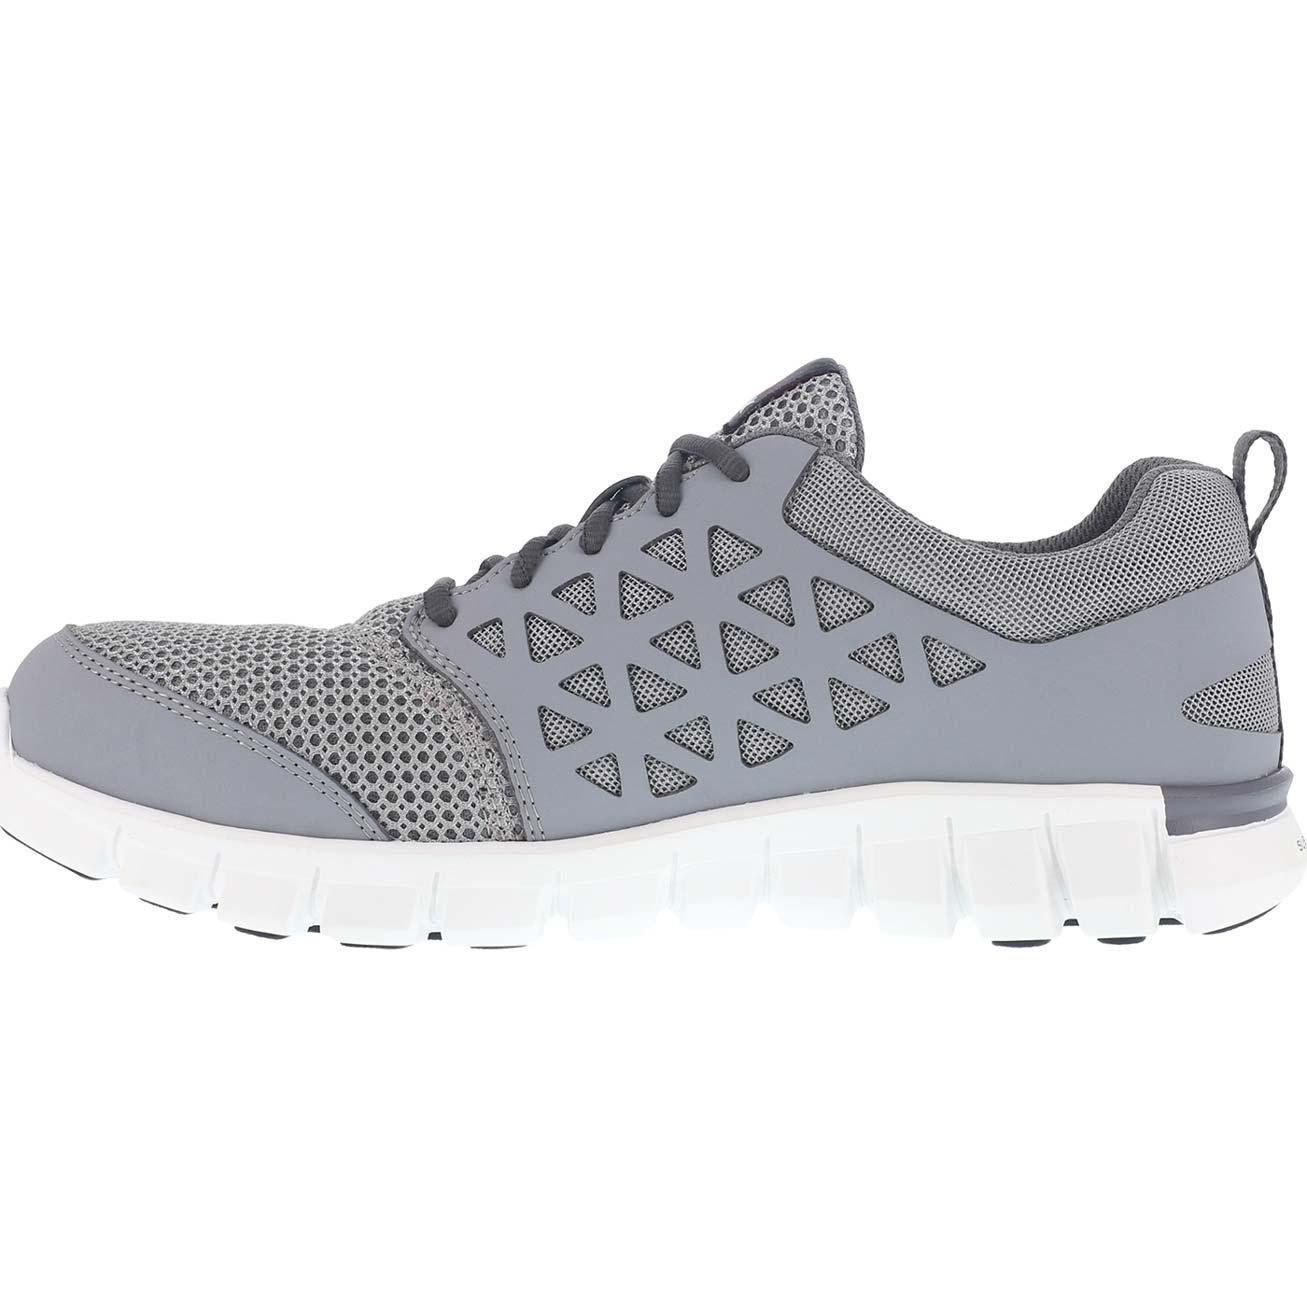 f8fb28f8cd4d5d Reebok Sublite Cushion Work Alloy Toe Work Athletic Shoe